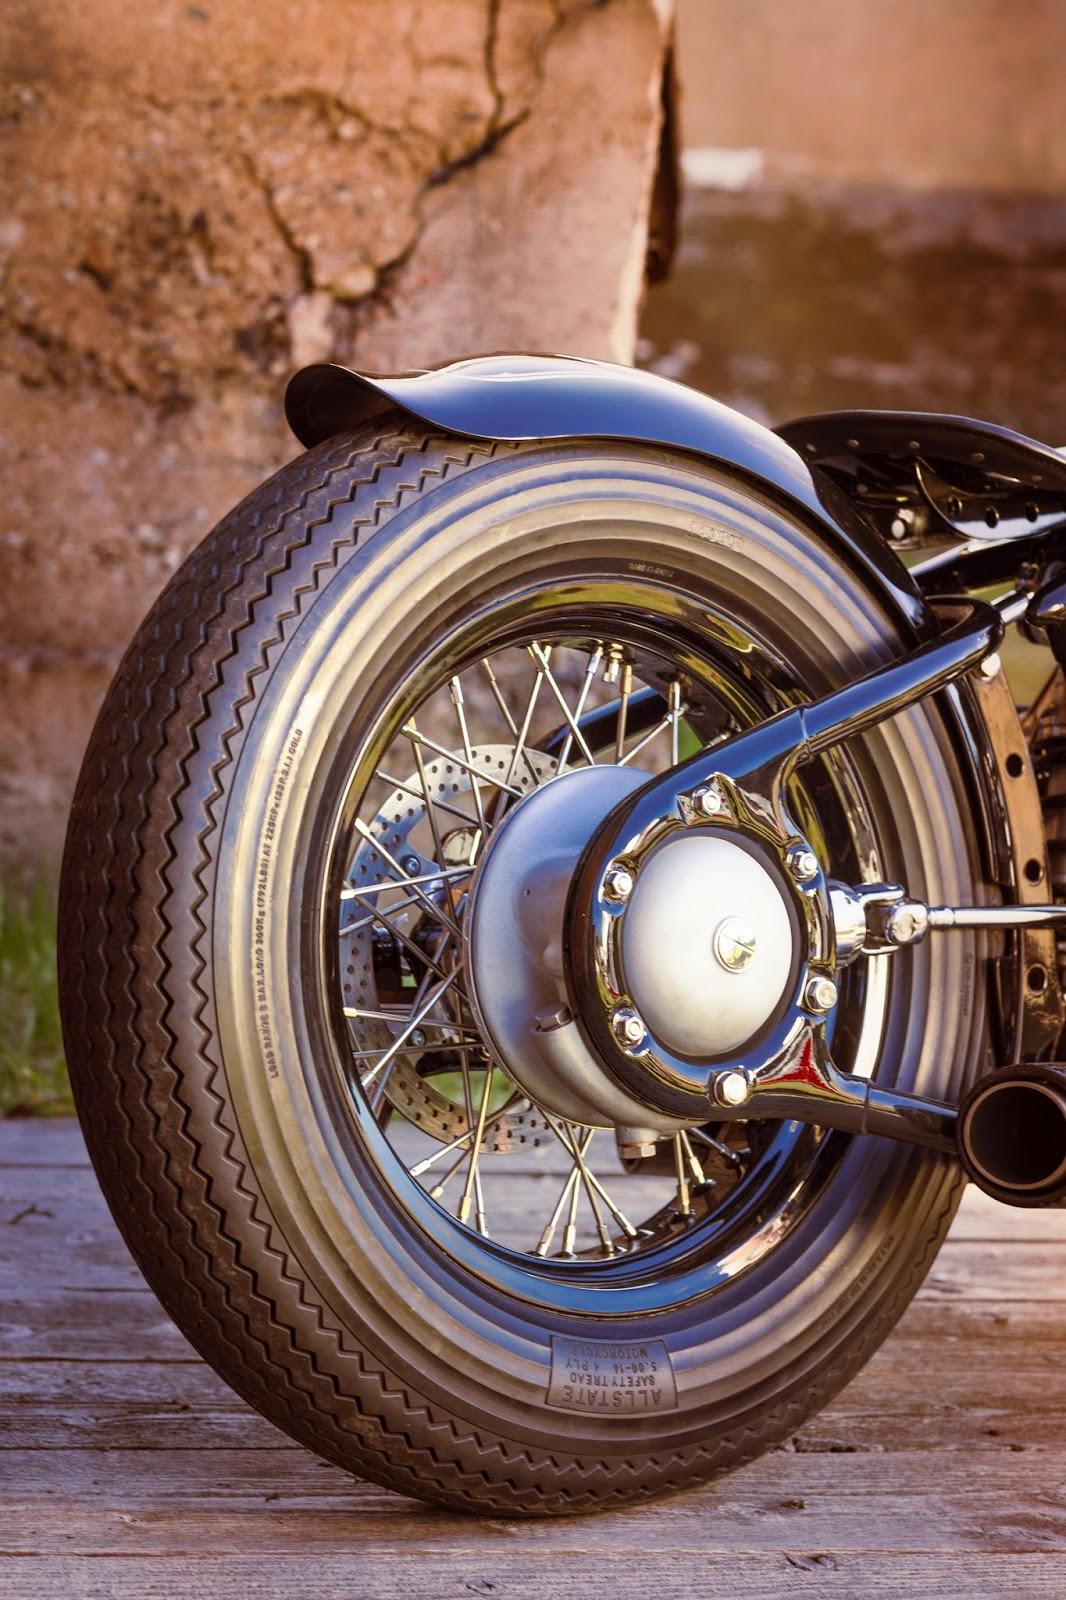 bmw-r5-hommage-bike-villa-deste-64-autonovosti.me-10